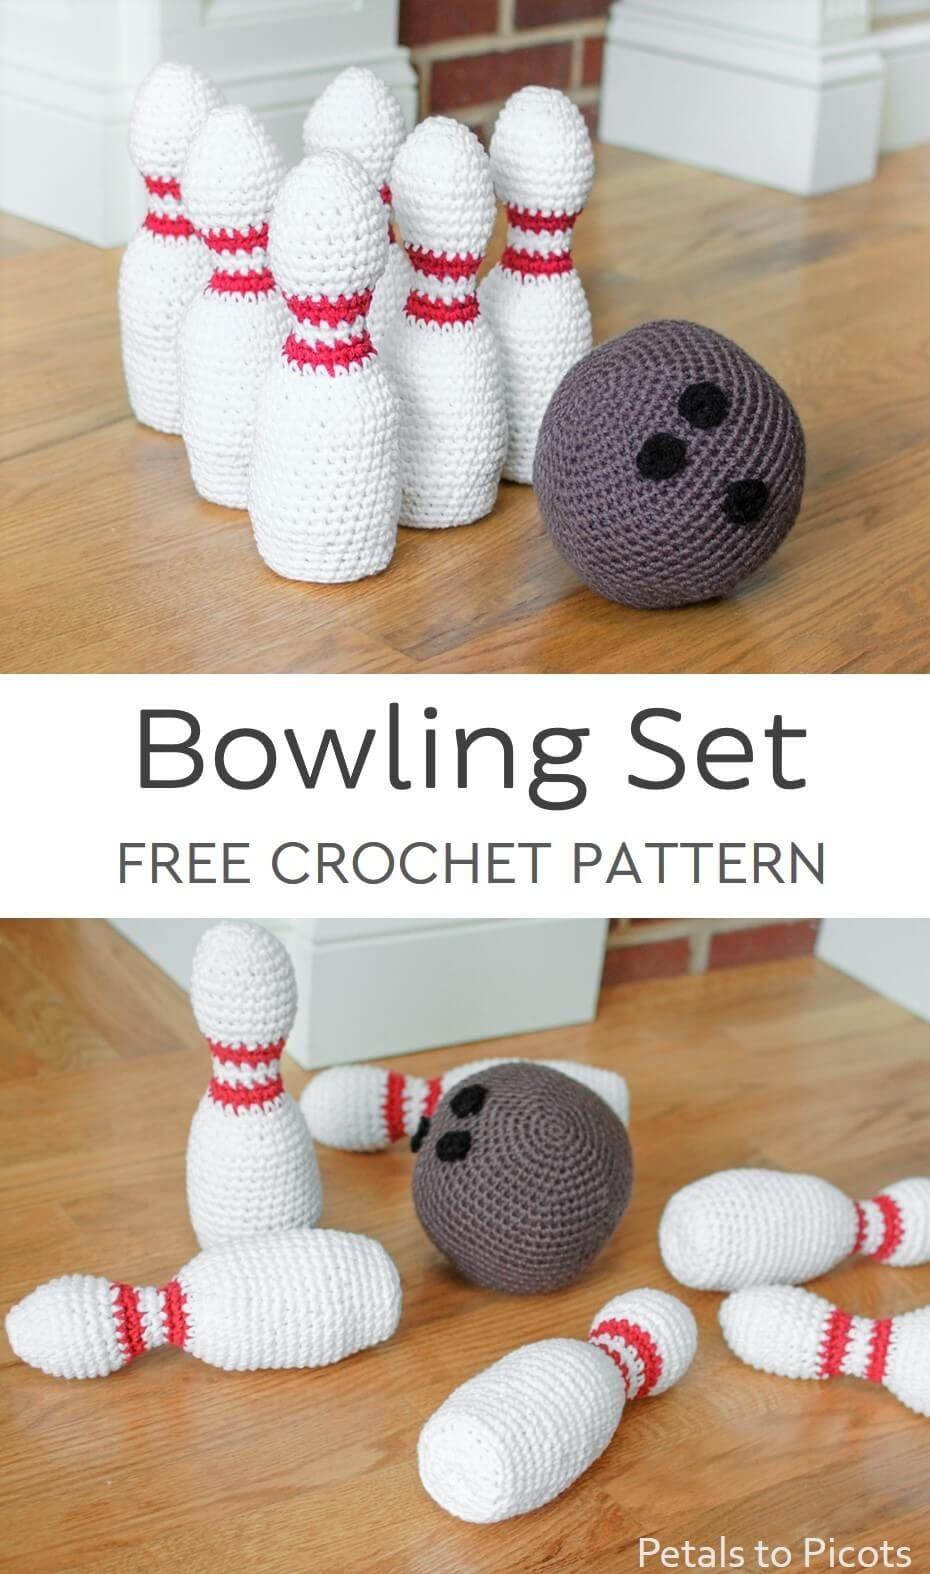 Crochet Bowling Set